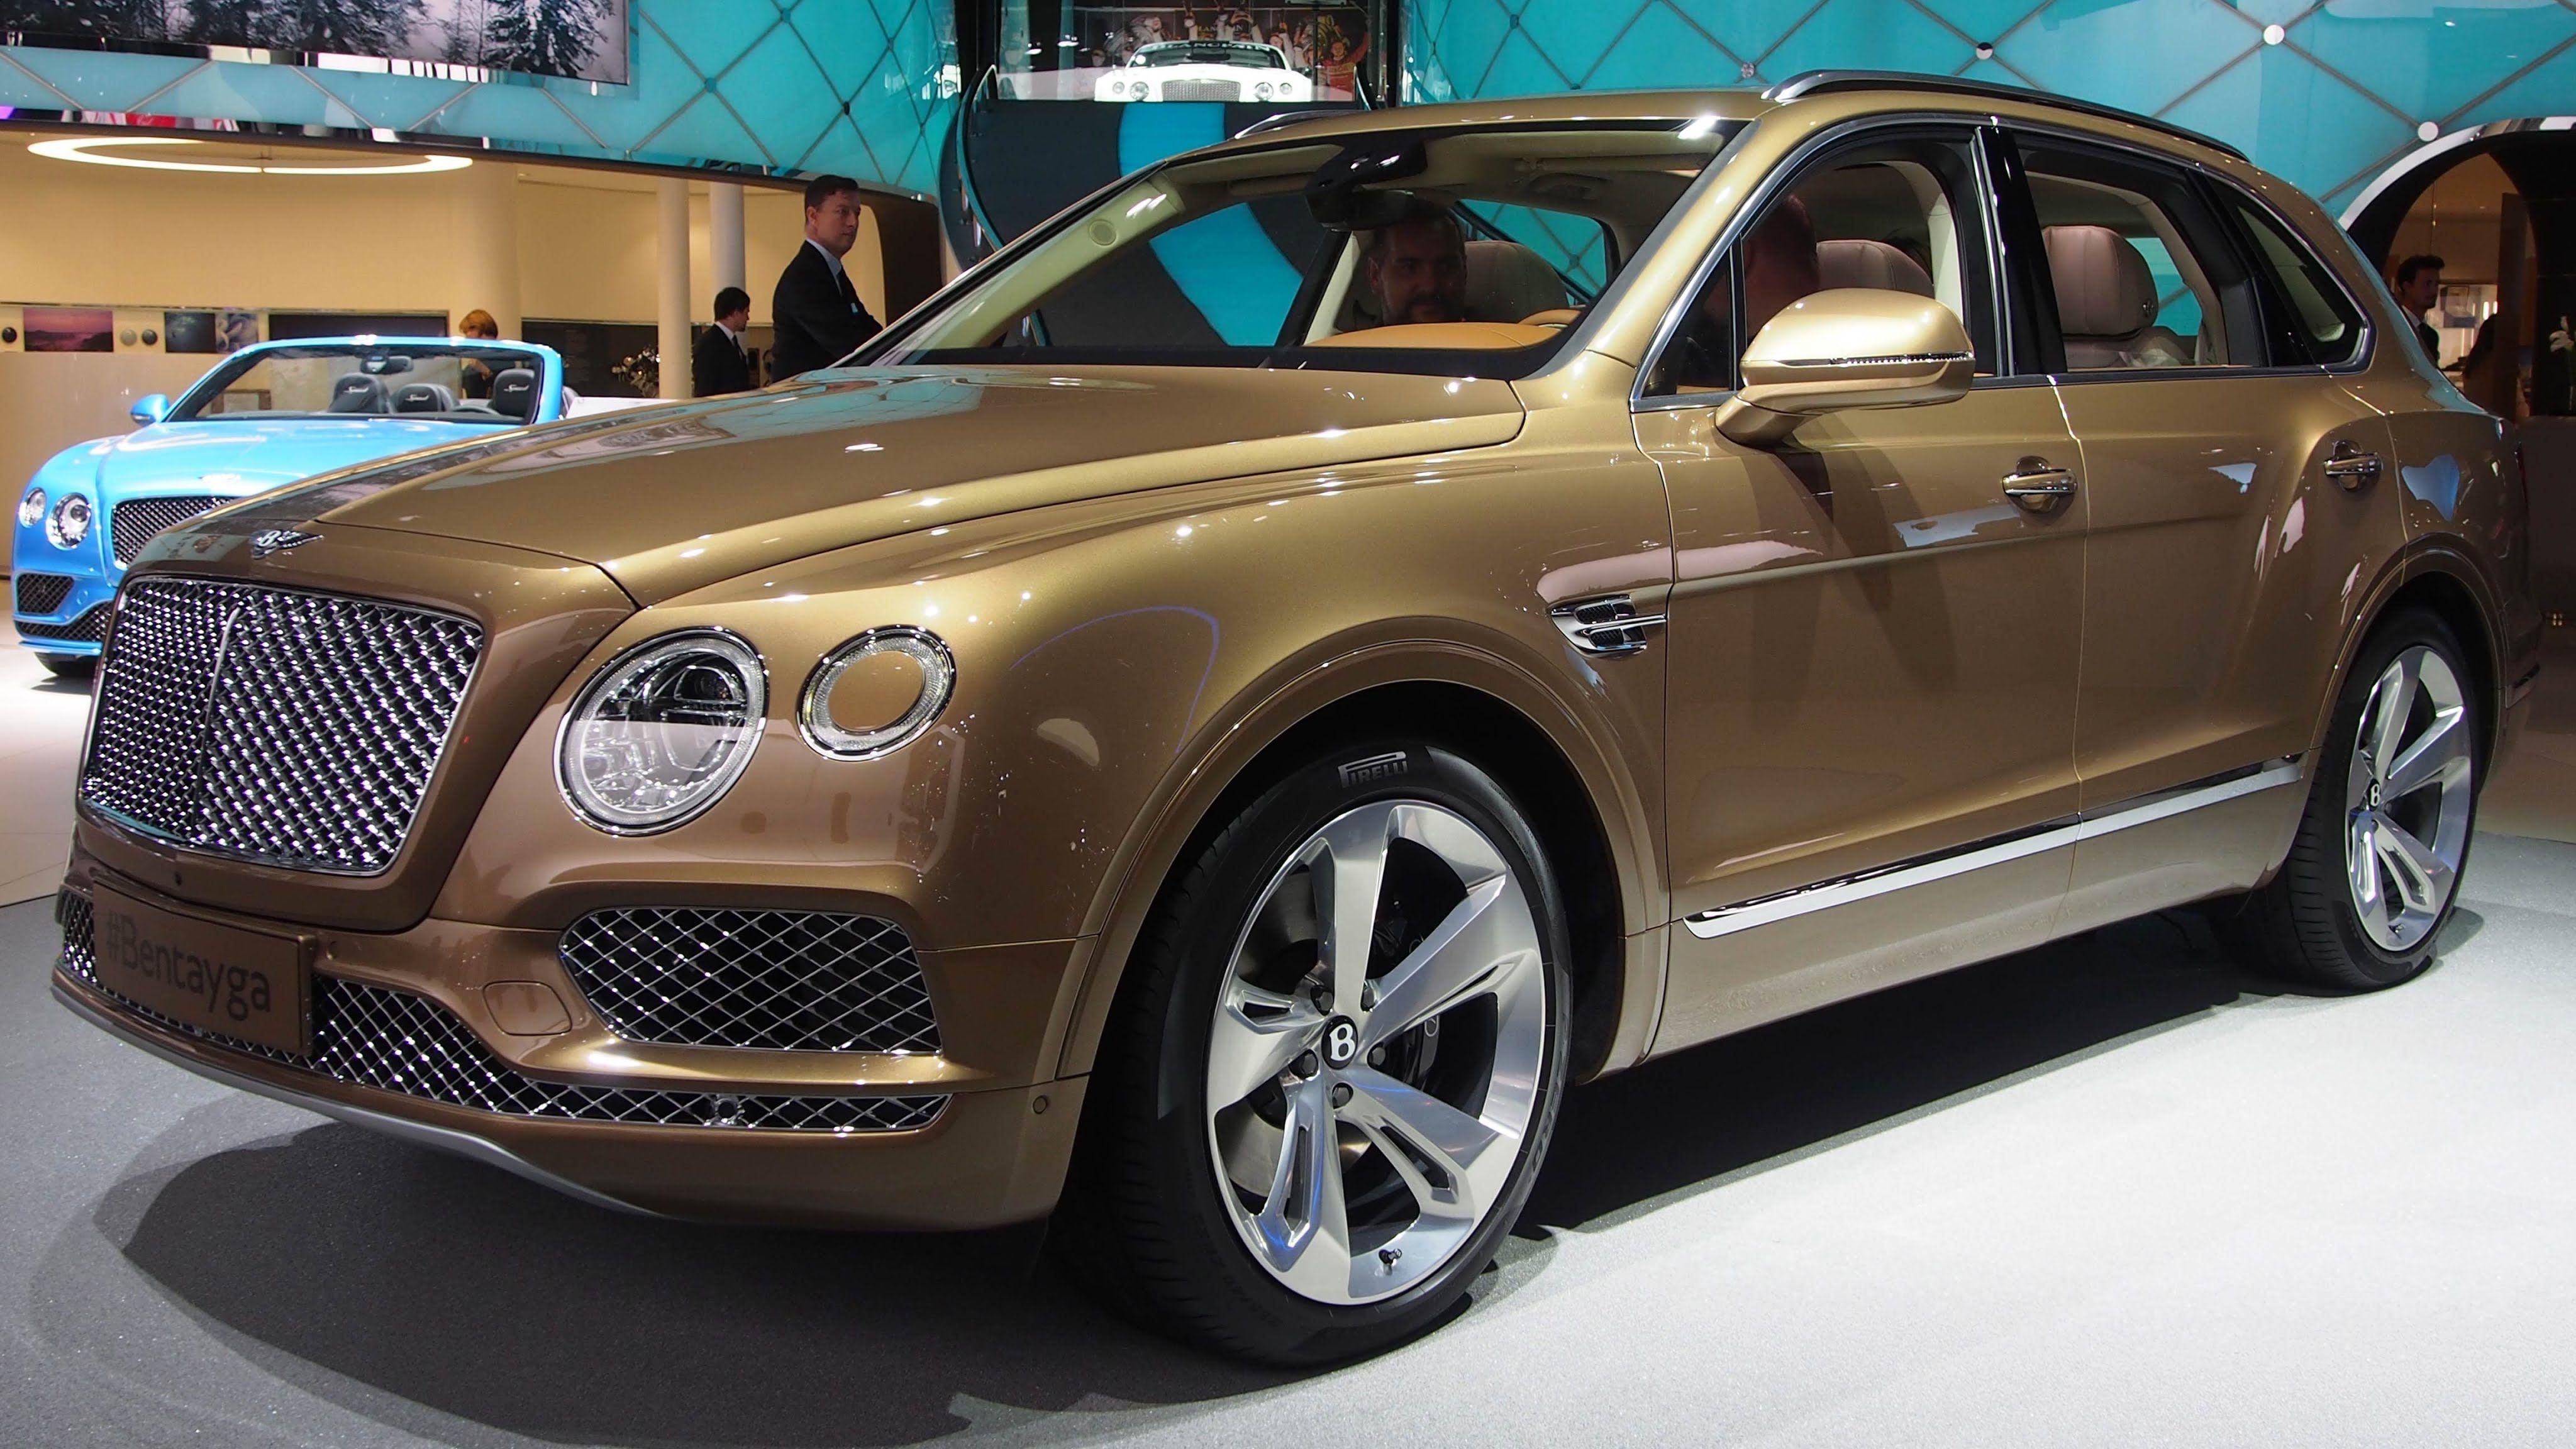 2016 Bentley Bentayga SUV twin turbocharged 6 0 litre W12 engine